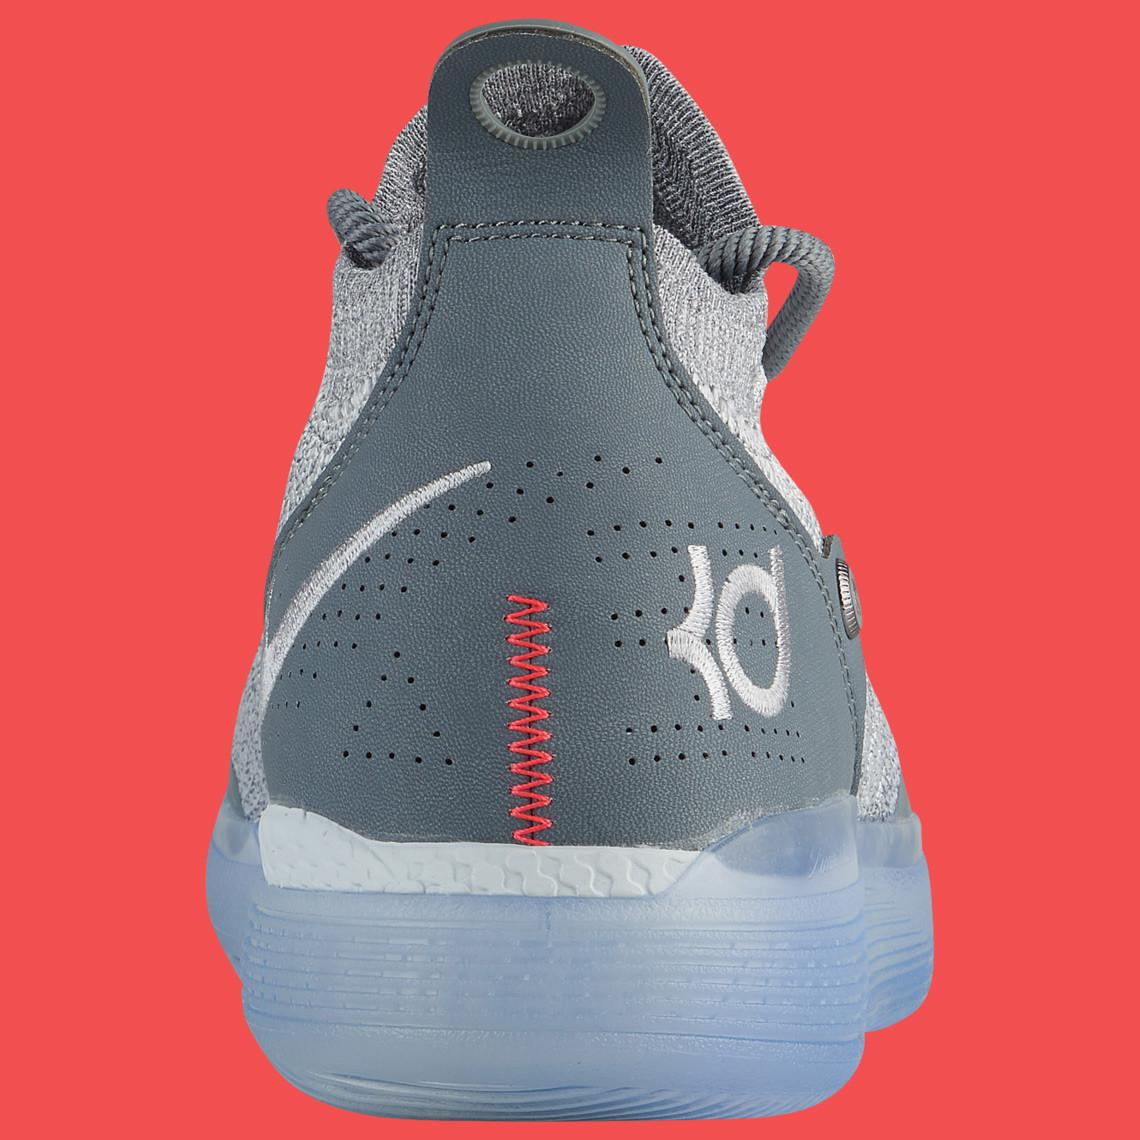 nike-kd-11-cool-grey-AO2604-002-2.jpg